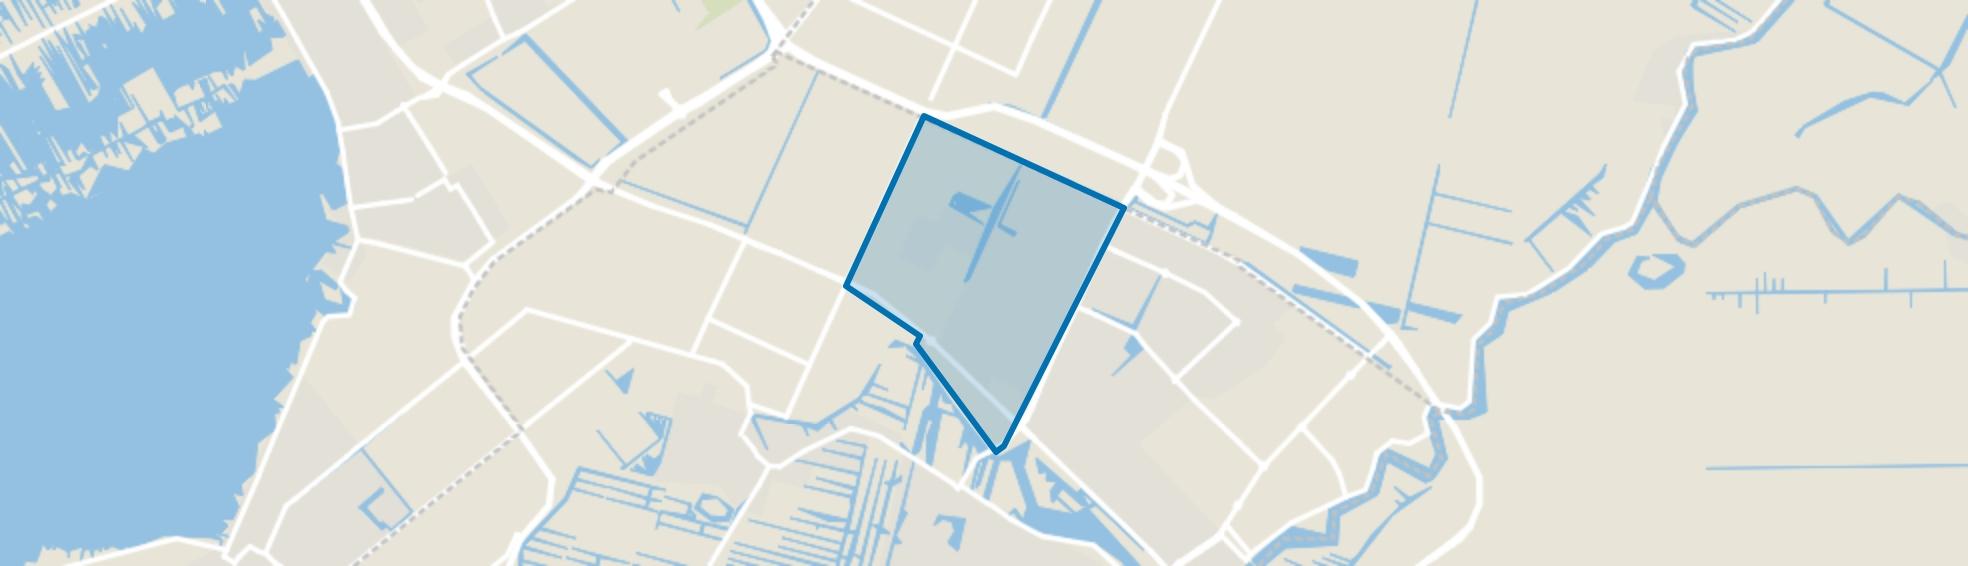 Legmeer, Uithoorn map